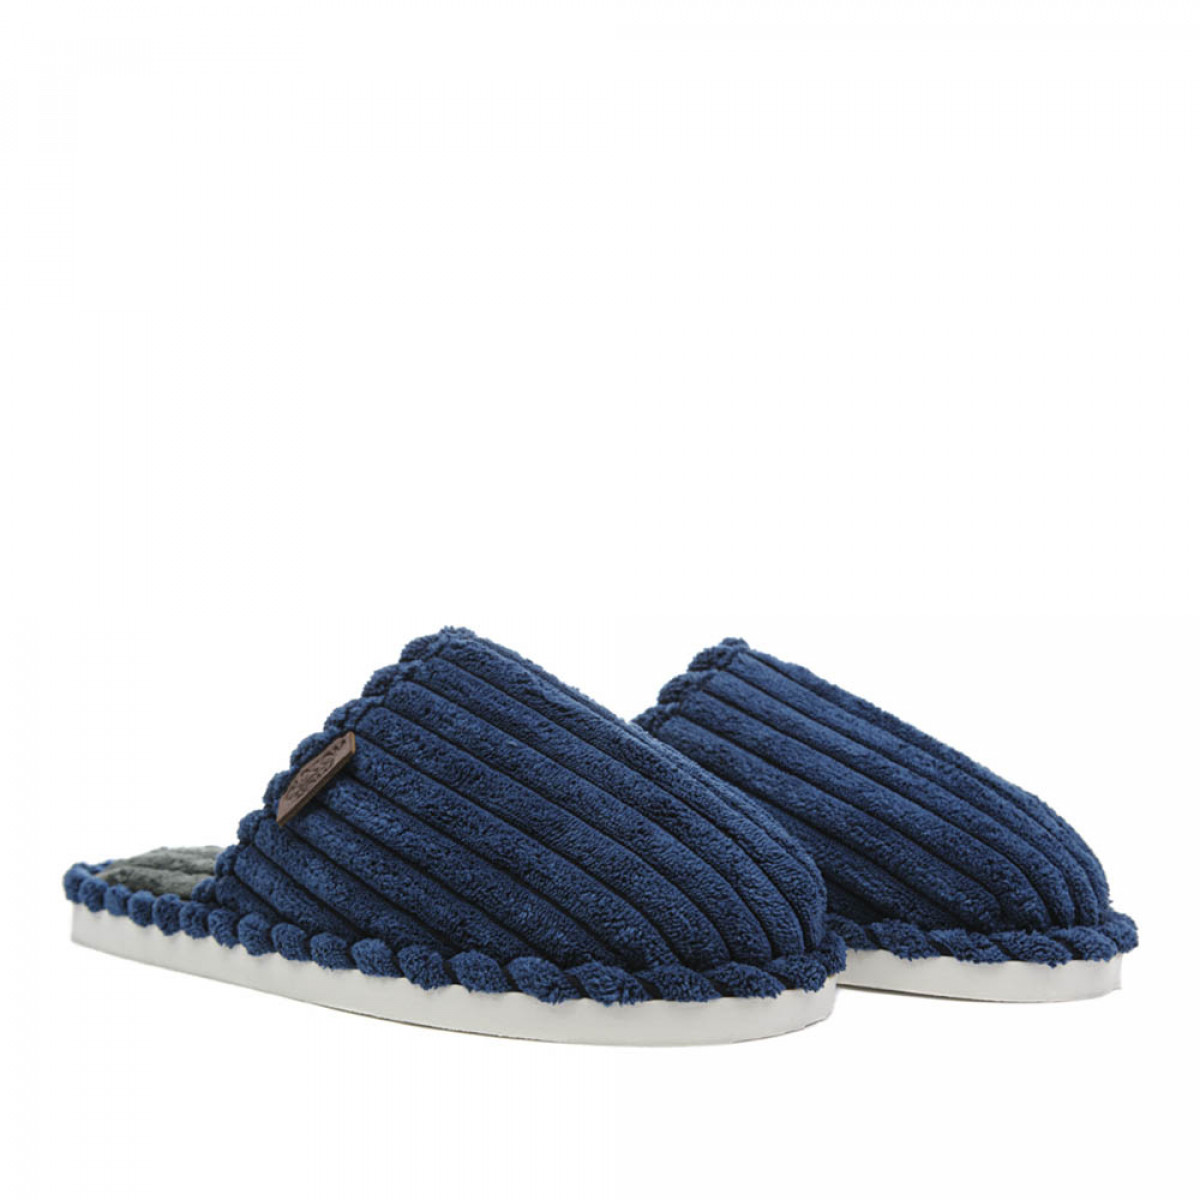 Home slippers LARRY, Blumarine